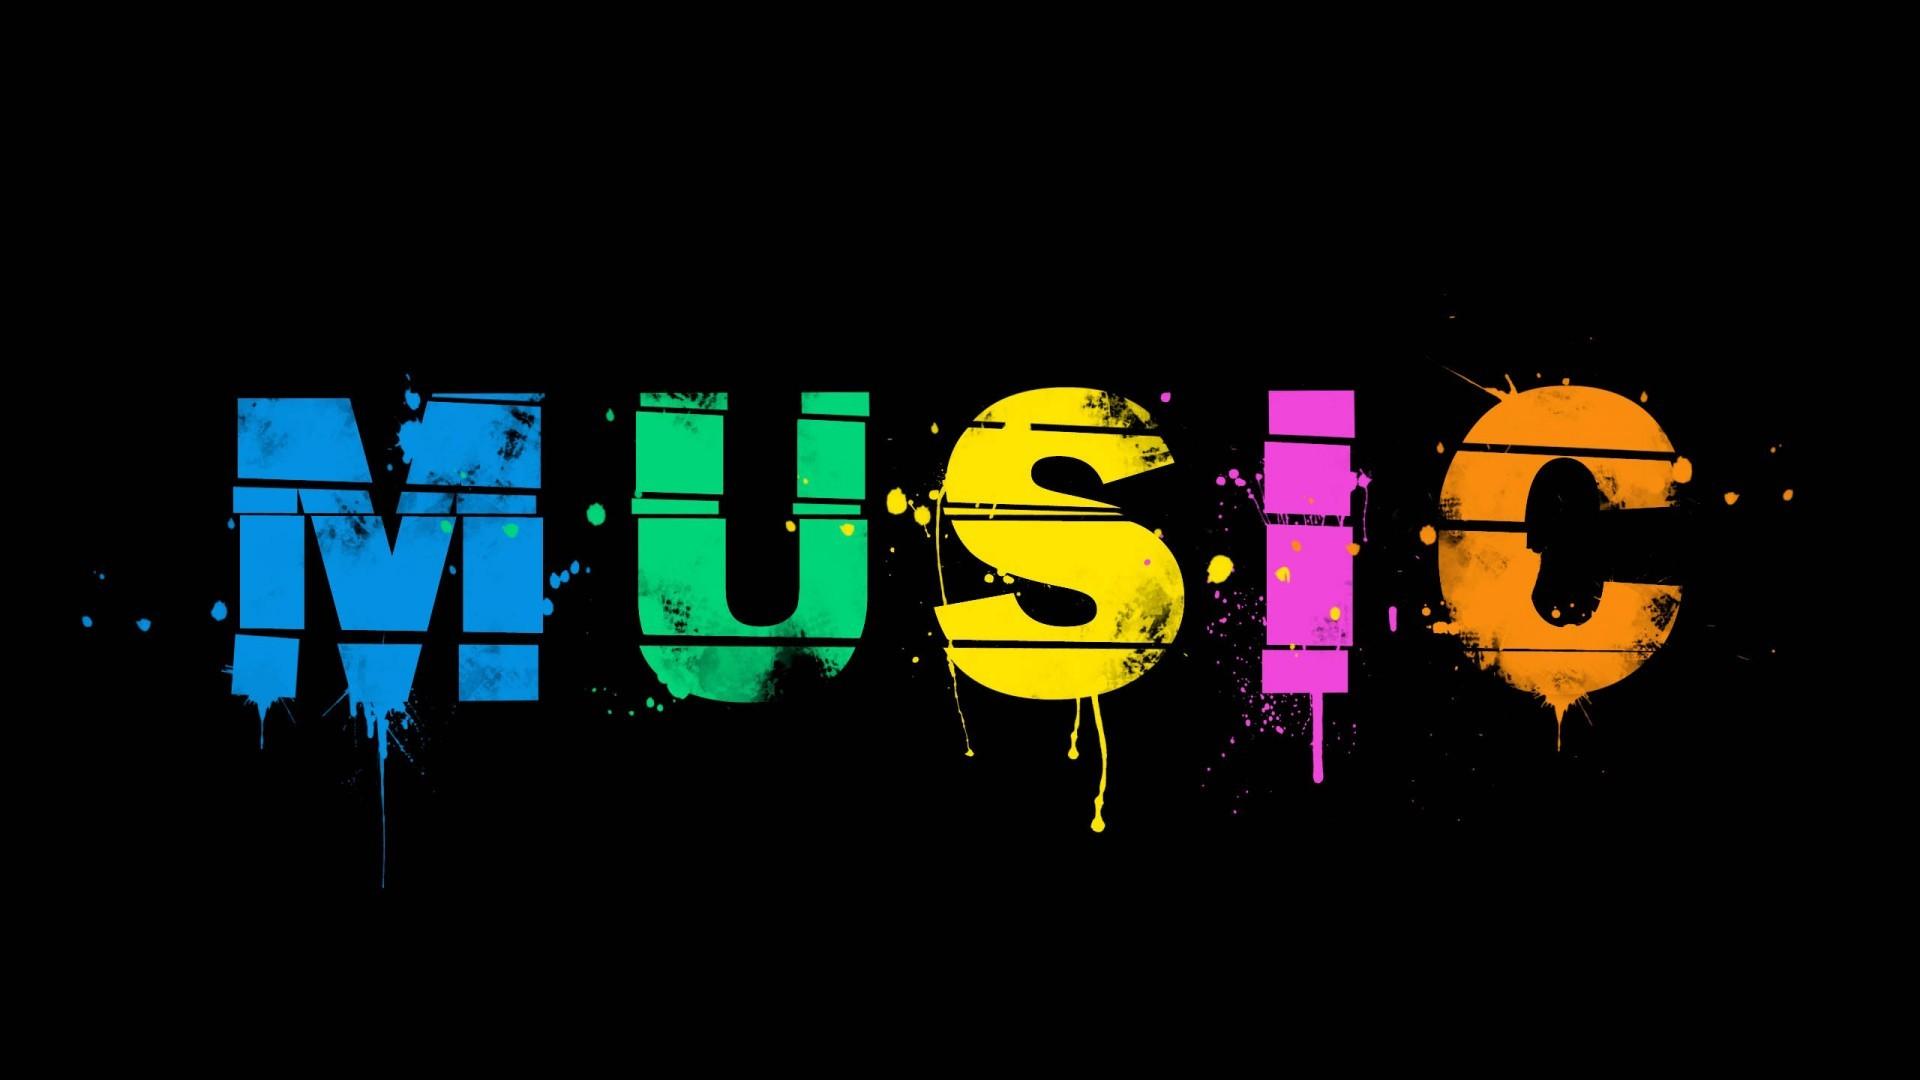 1920x1080 Colorful Music Wallpaper Altilici Love HD Desktop High Definition Mobile